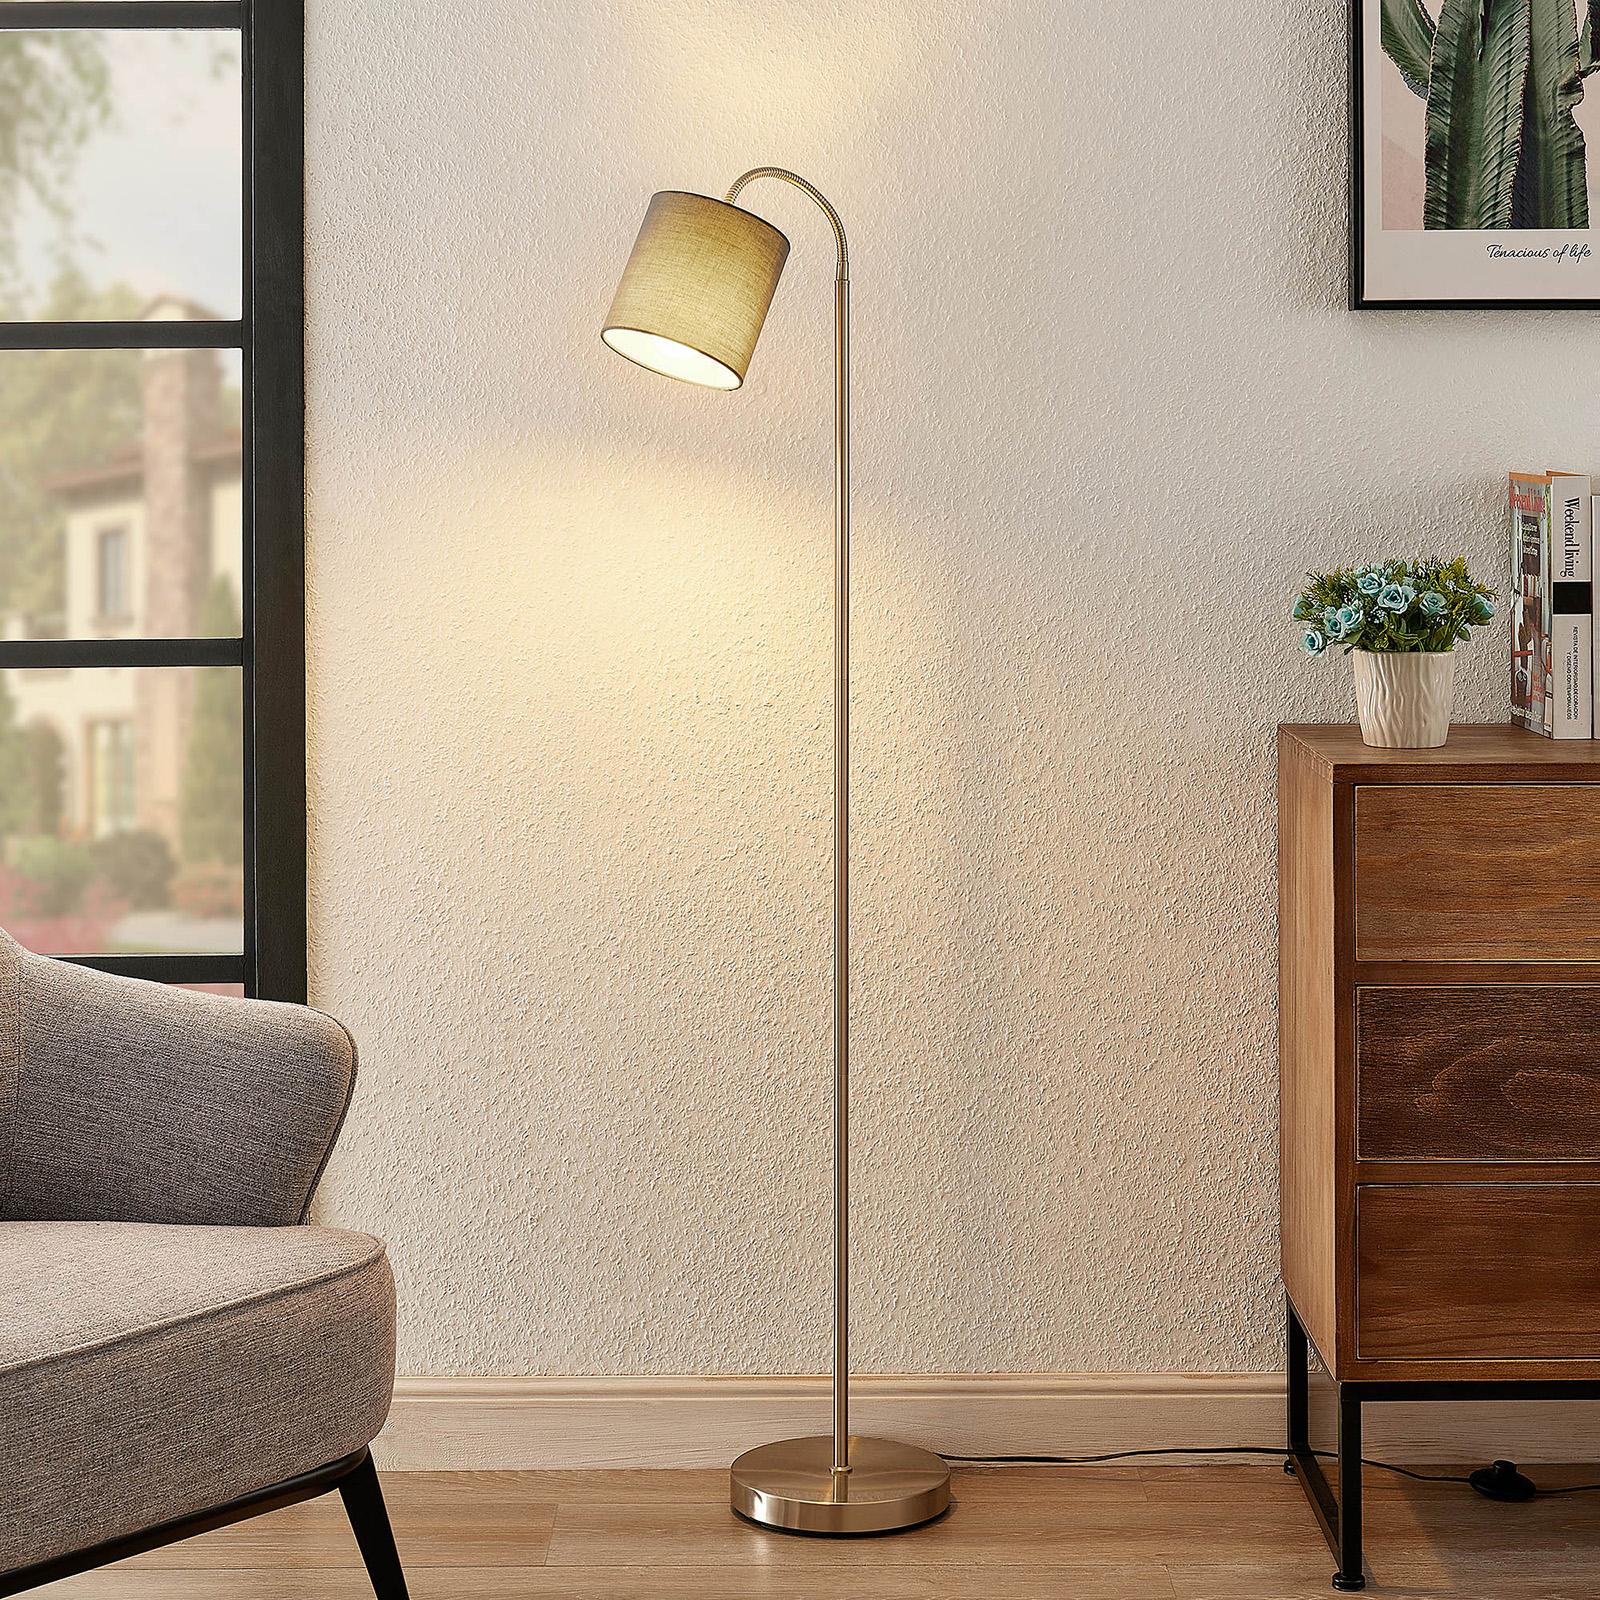 Lindby Manu golvlampa, textil, 1 lampa, grå